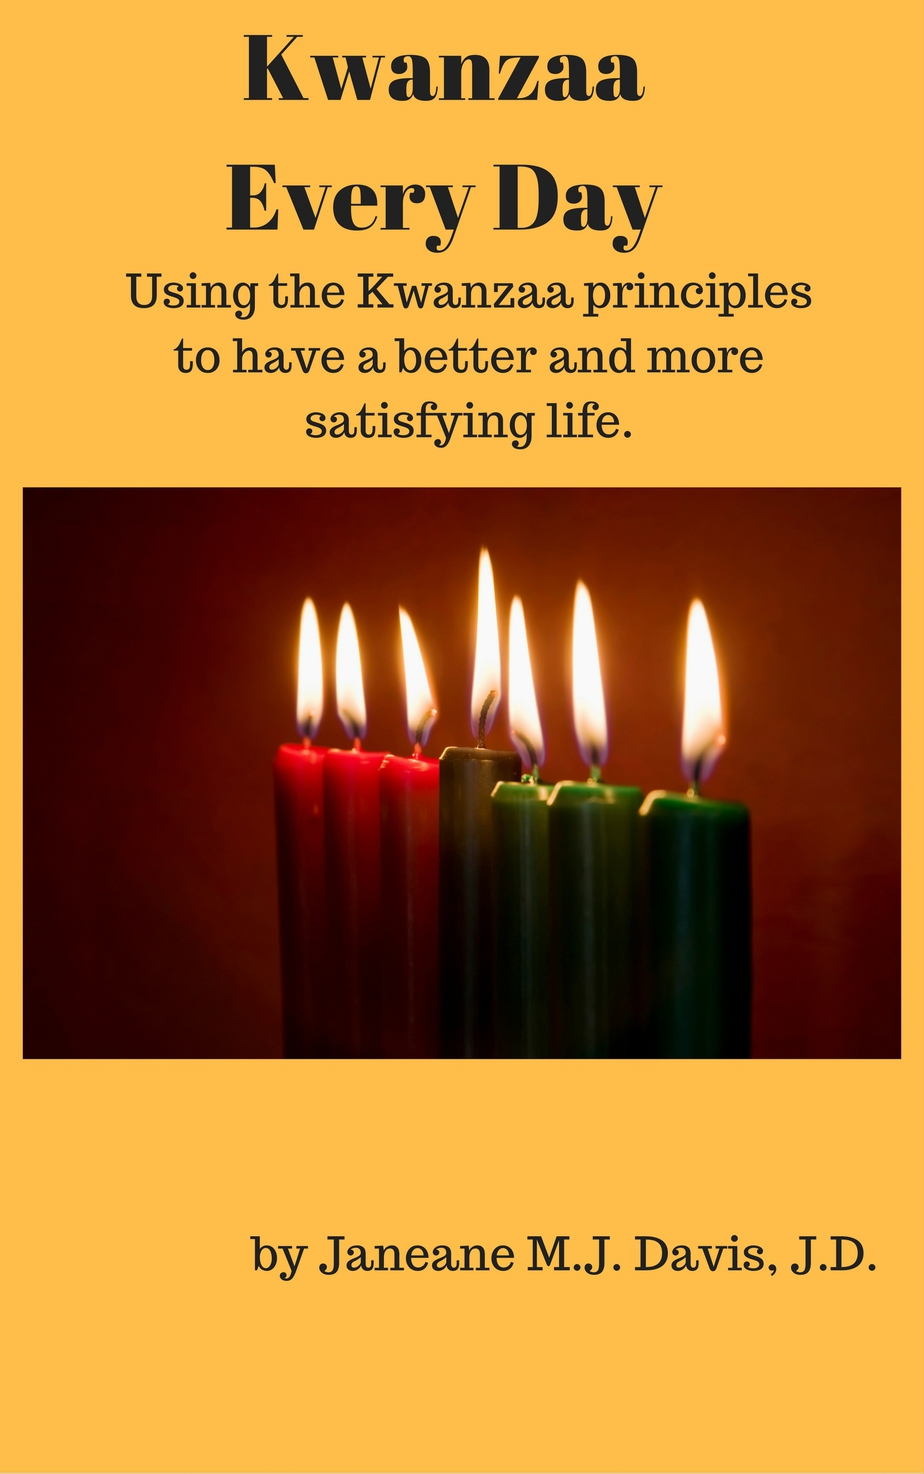 Kwanzaa Every Day